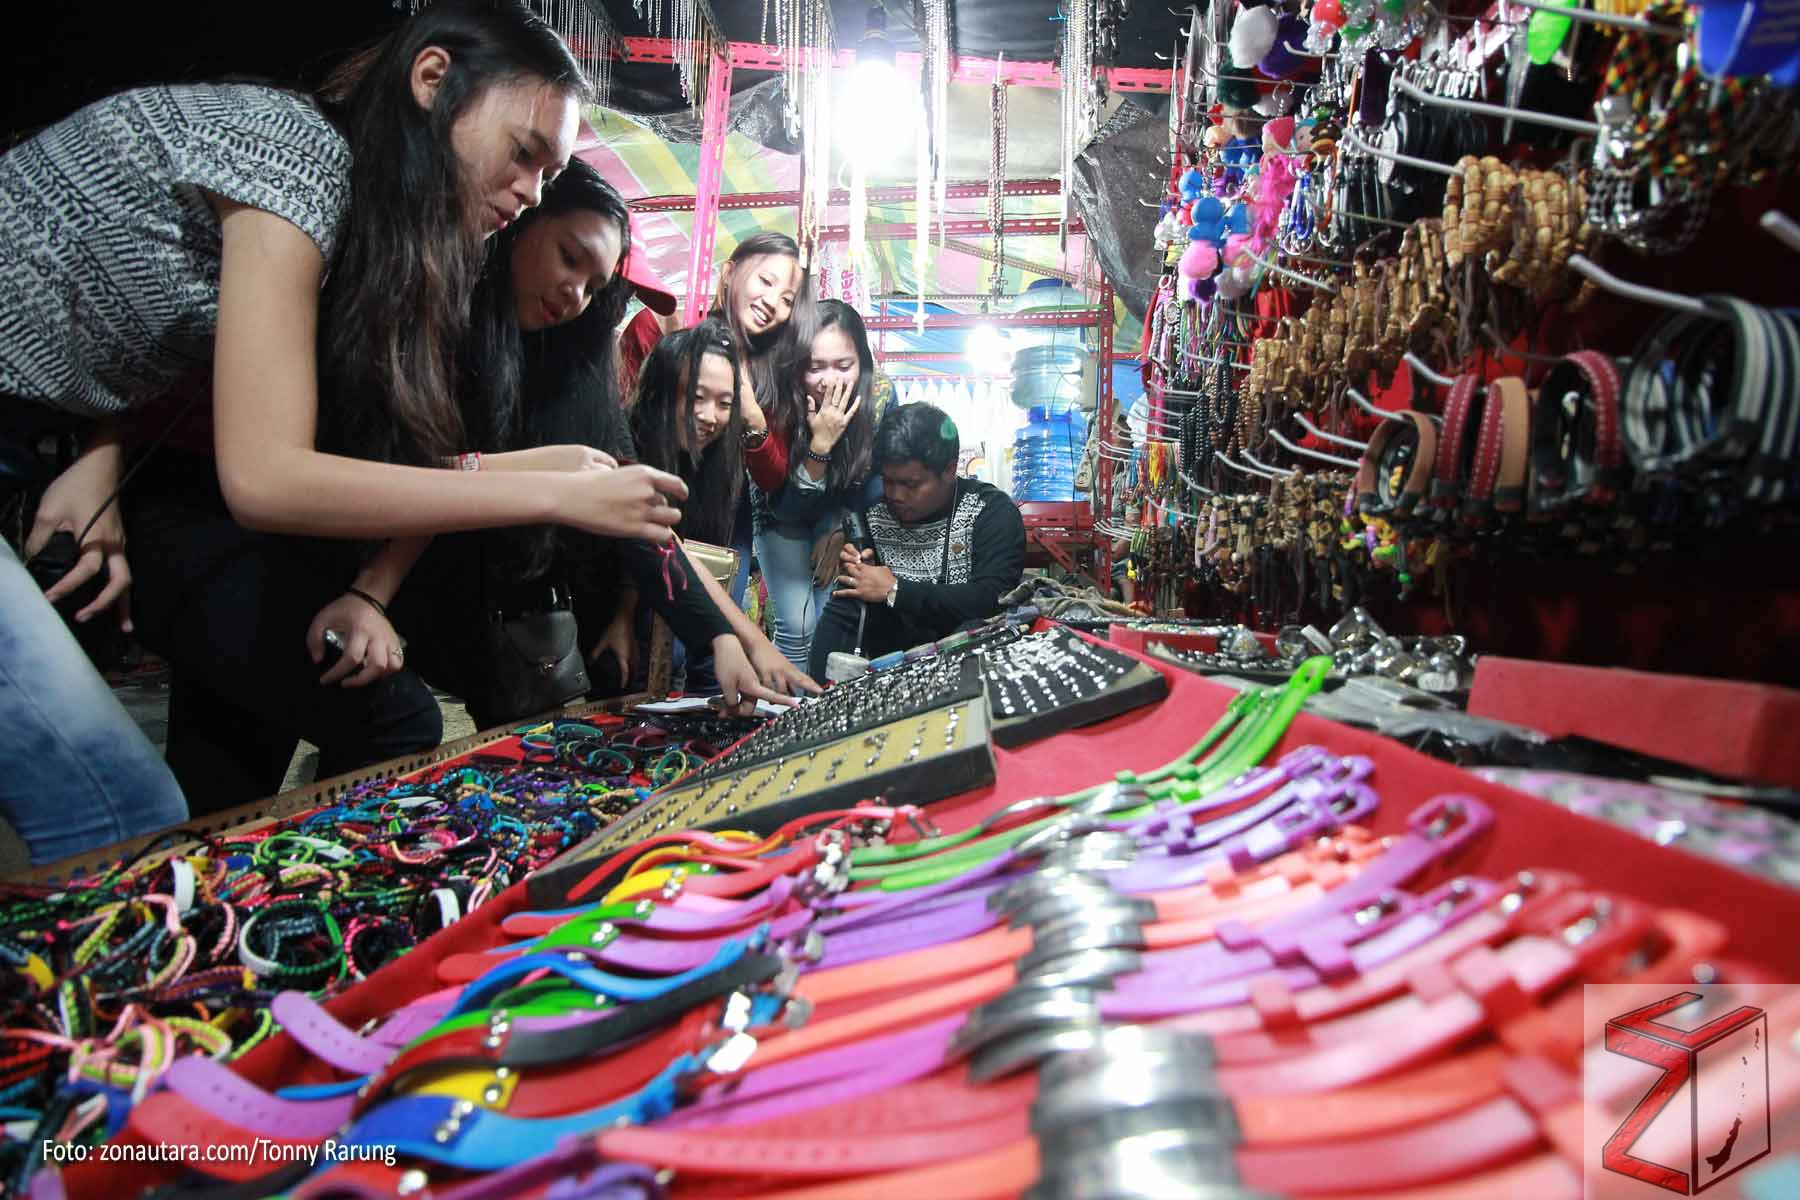 Peluang Usaha Baru di Bandung Modal Minim Wow Jual Barang Bekas di Pasar Malam Bisa Jadi Peluang Usaha